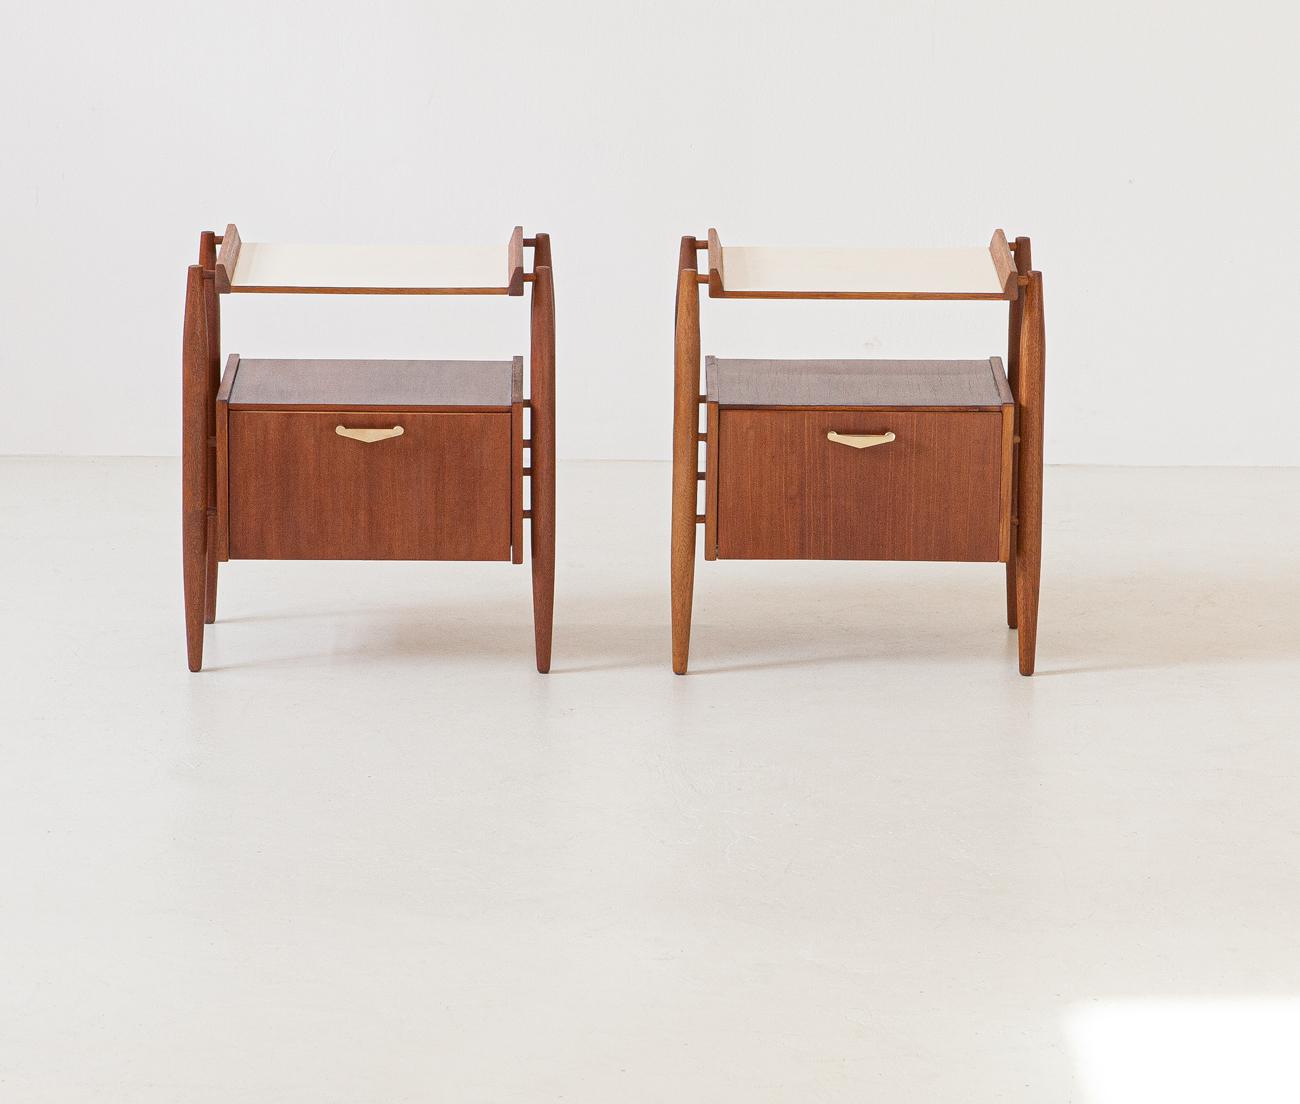 1950s-italian-bedside-tables-8-bt82